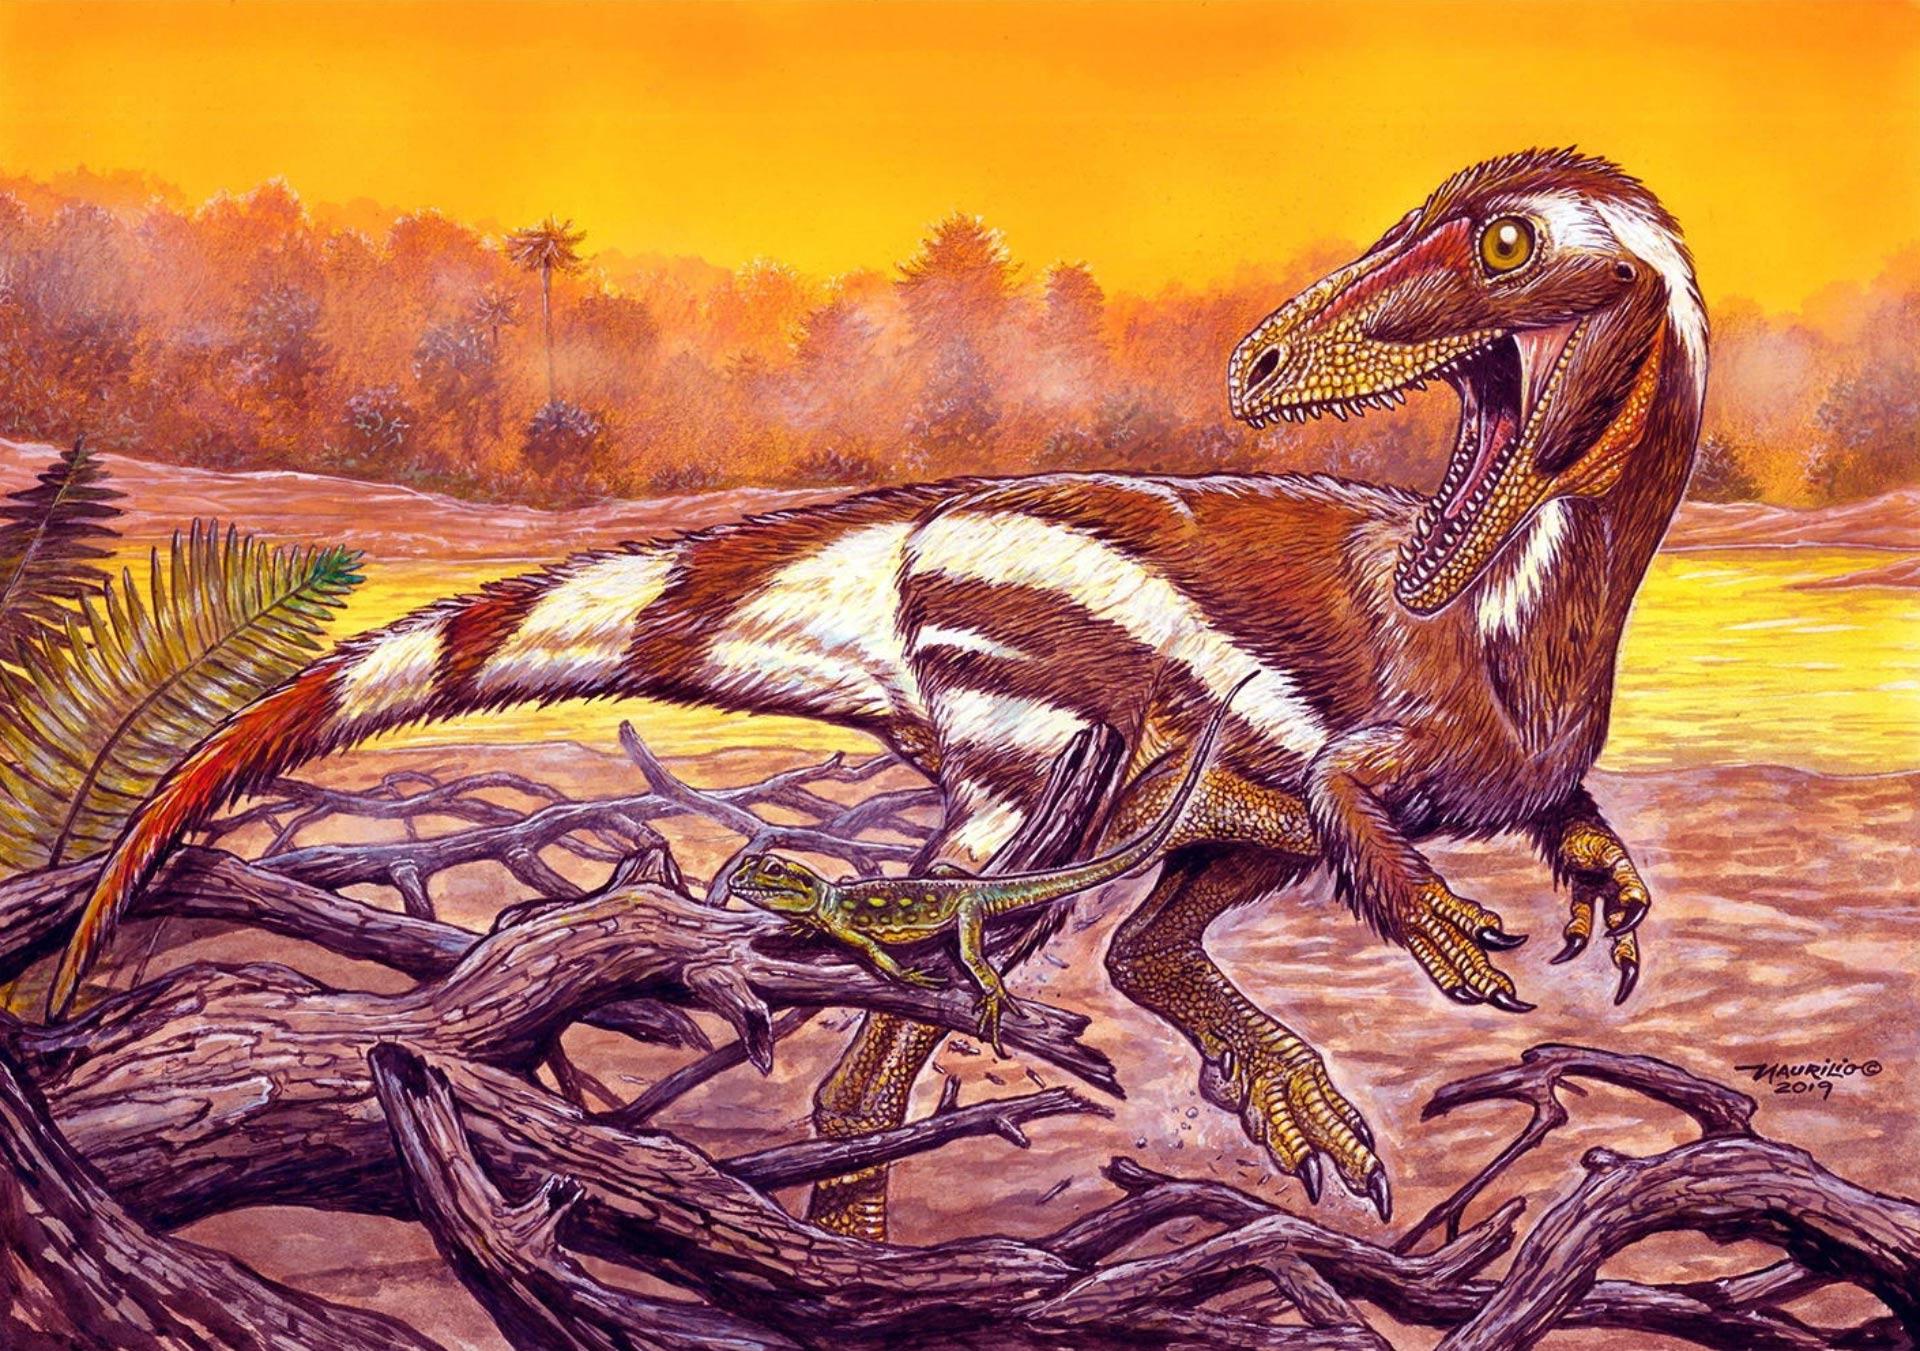 aratasaurus_museunacionali_maurilio_oliveira.jpg